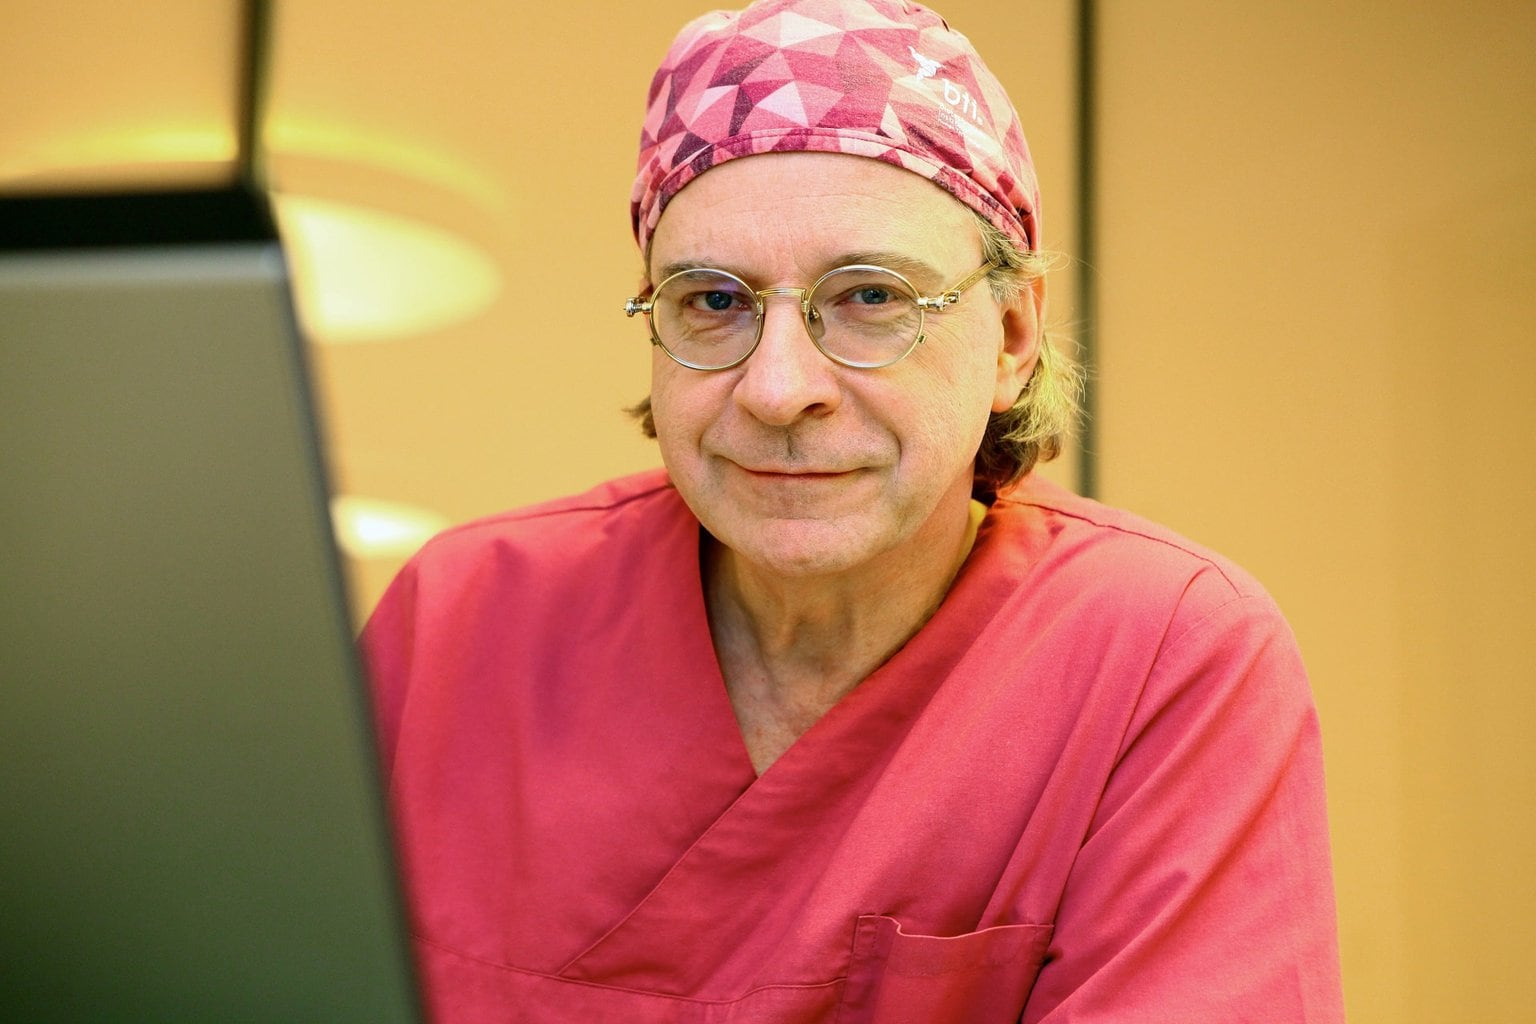 Bleaching Frankfurt, Implantologie Frankfurt, Parodontologie Frankfurt, Professionelle Zahnreinigung Frankfurt, Veneers Frankfurt